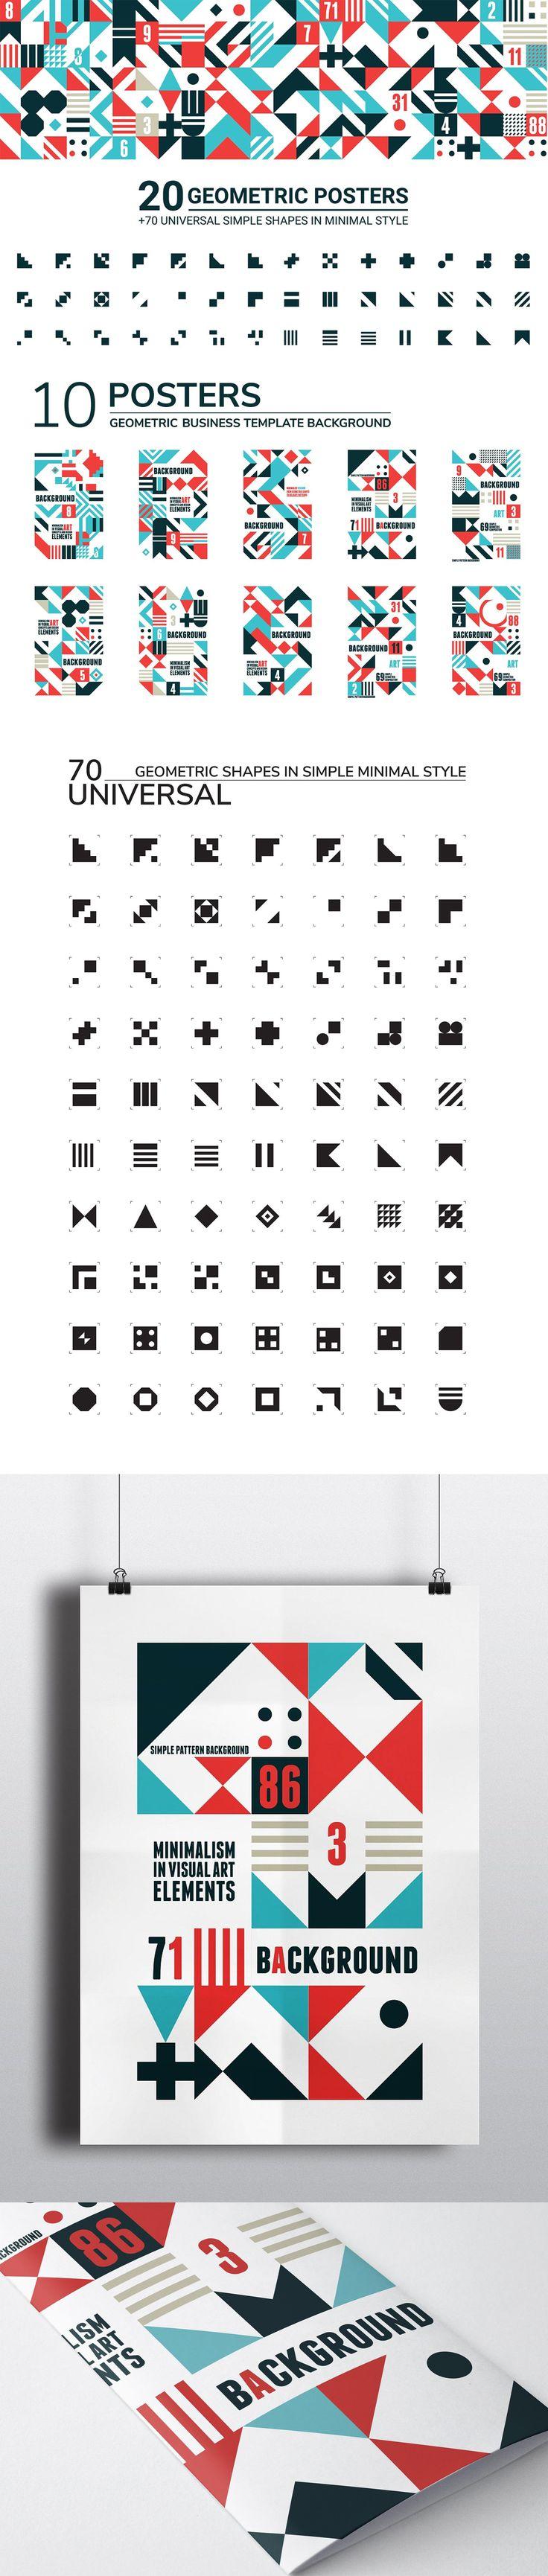 #Freebies : 20 original posters in minimalist swiss style and 70 geometric elements. #Geometric #posters consist of easy editable blocks. ( #creative #designtrend #webdesign #print #inspiration #packaging #branding )